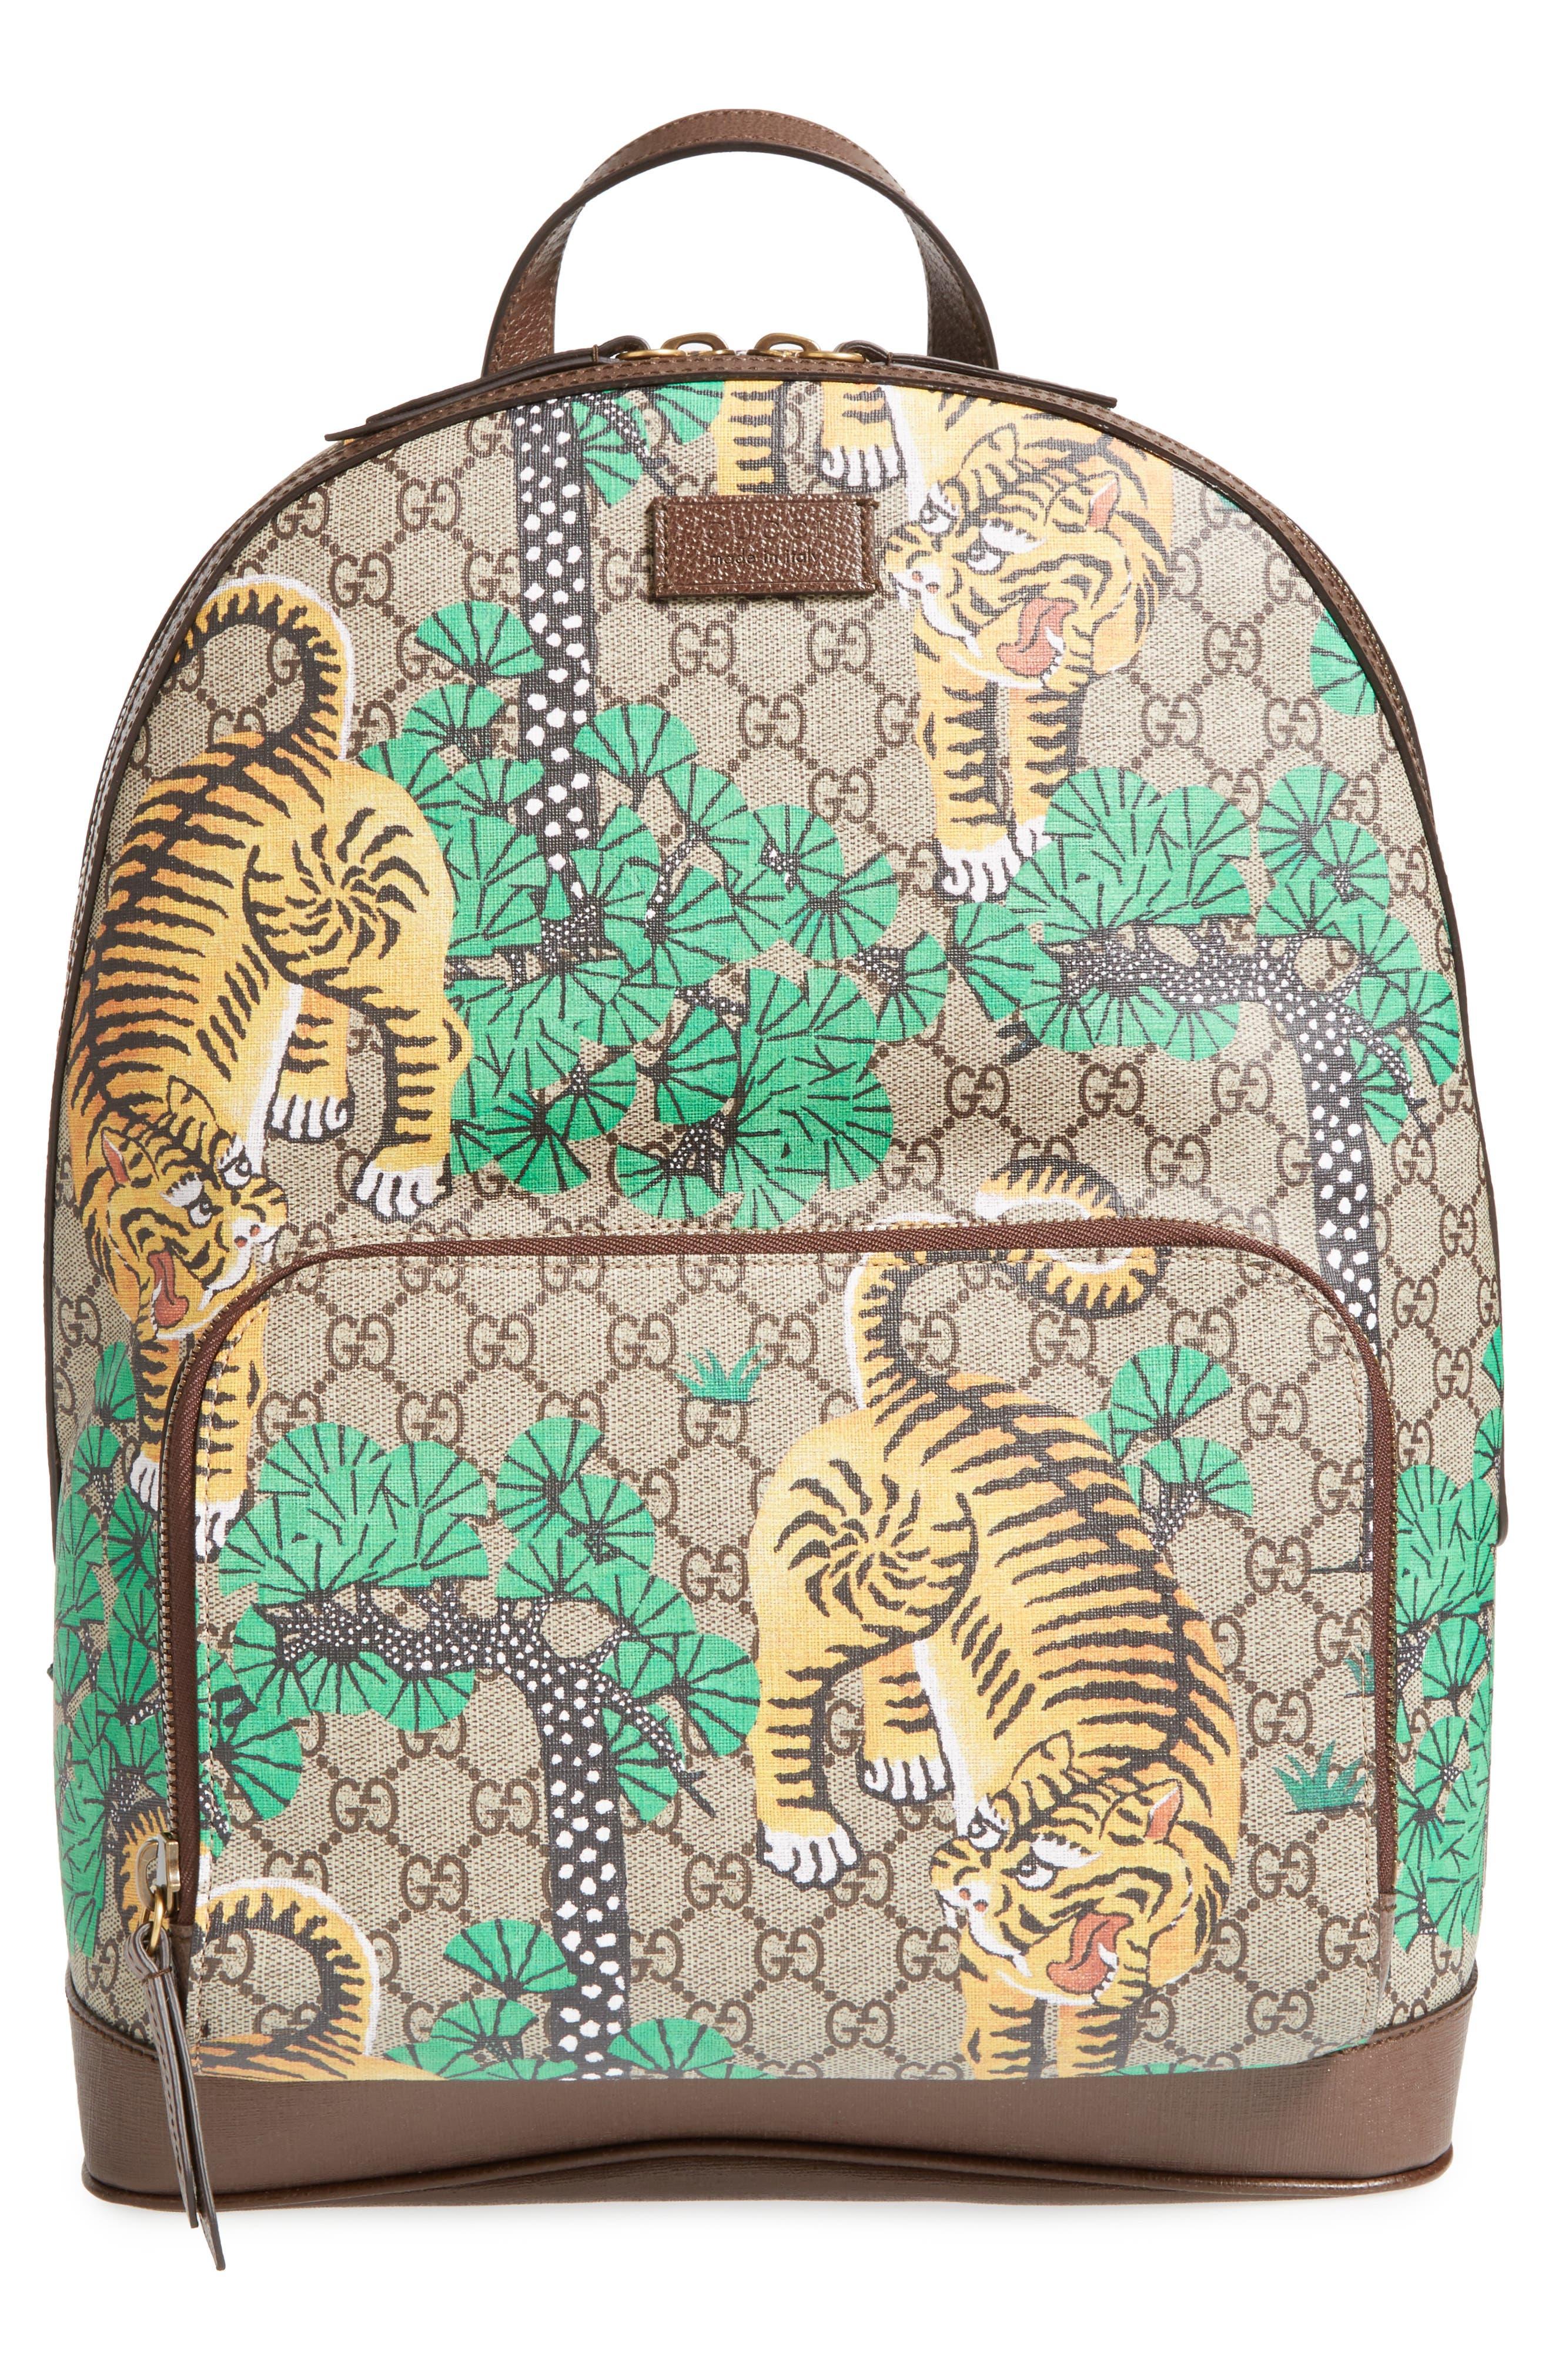 Tiger Cub Supreme Canvas Backpack, Main, color, 250